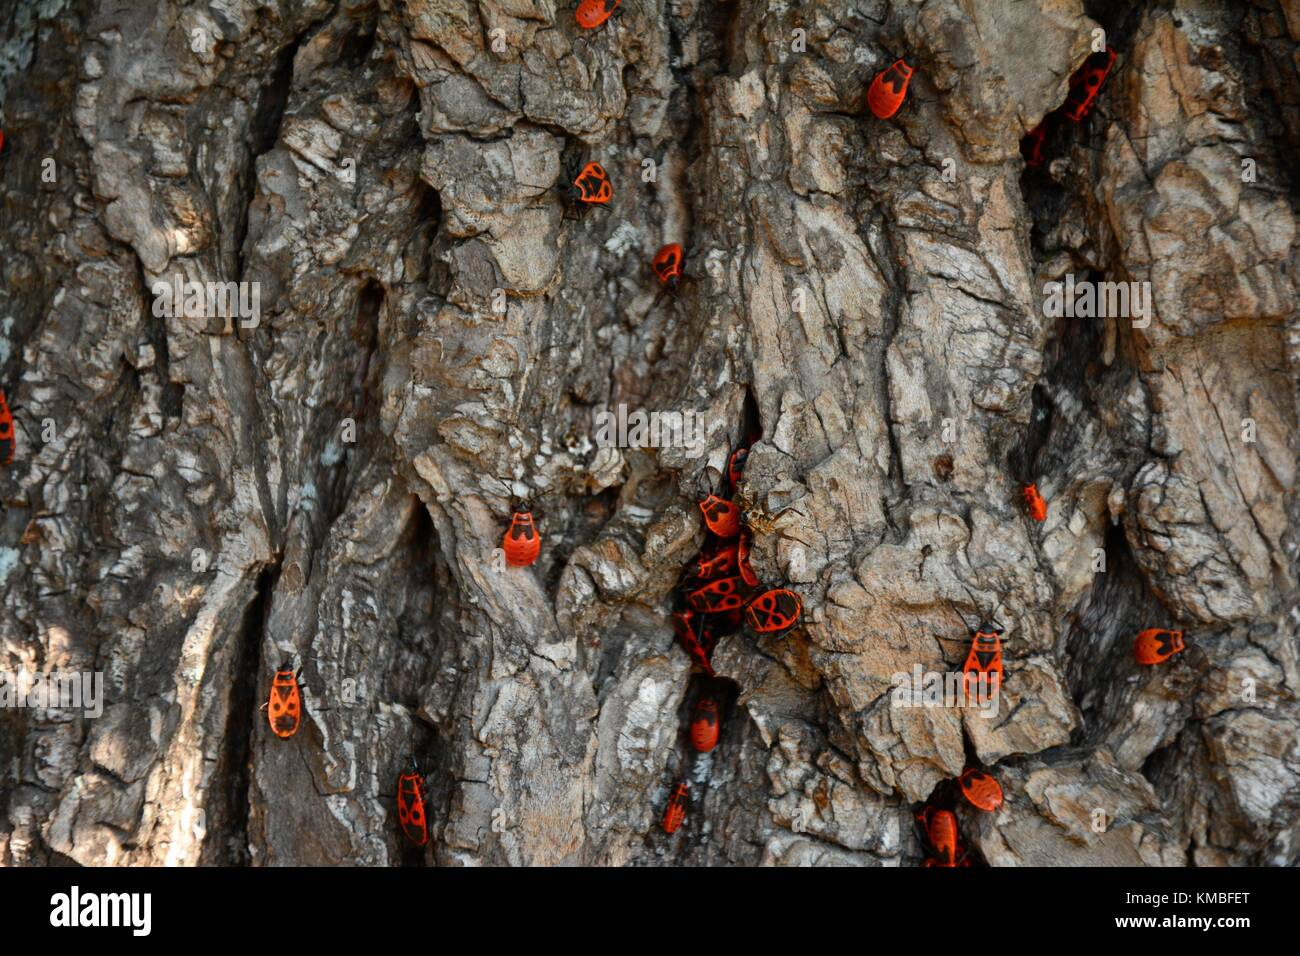 Gendarme beetles (lat. Pyrrhocoris apterus) aggregation on a tree trunk - Stock Image